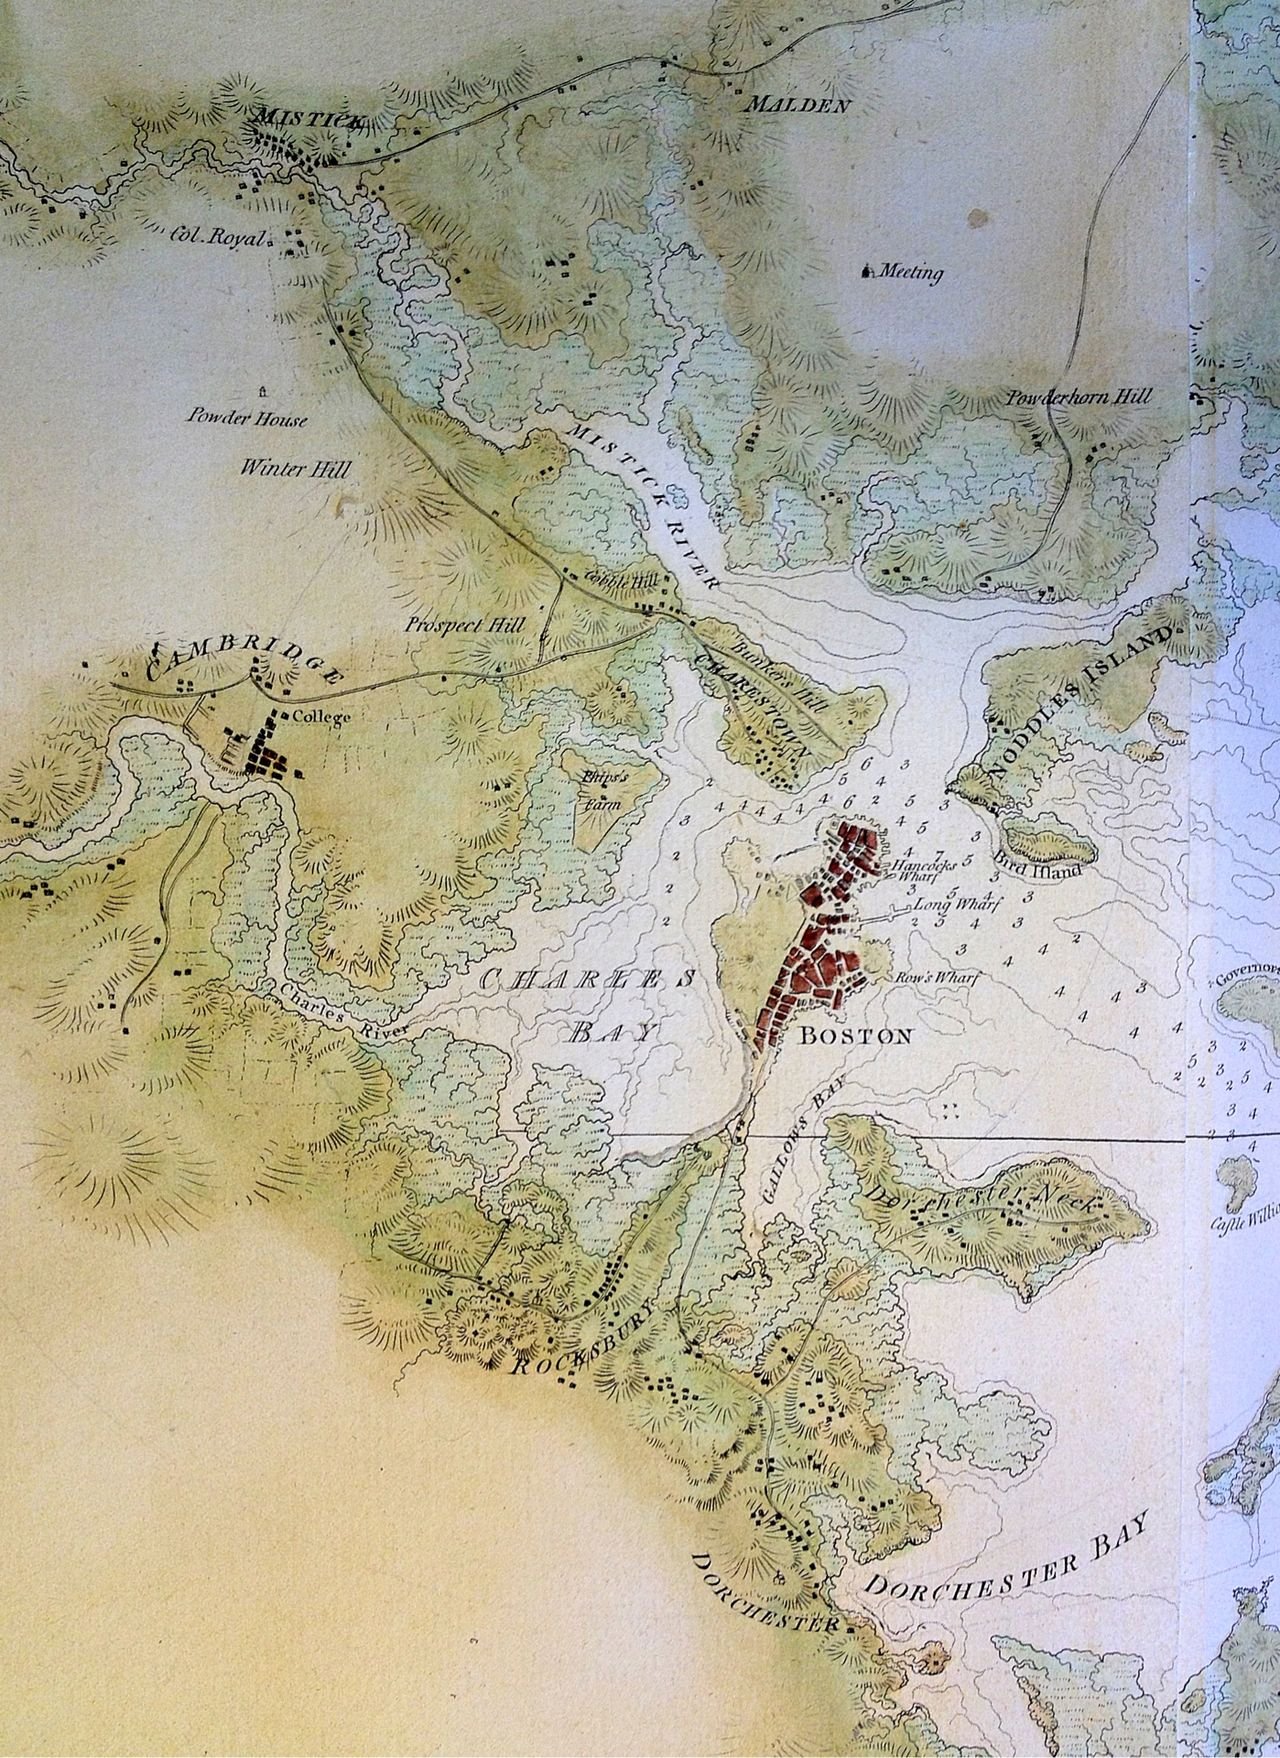 1776 Map Of Boston